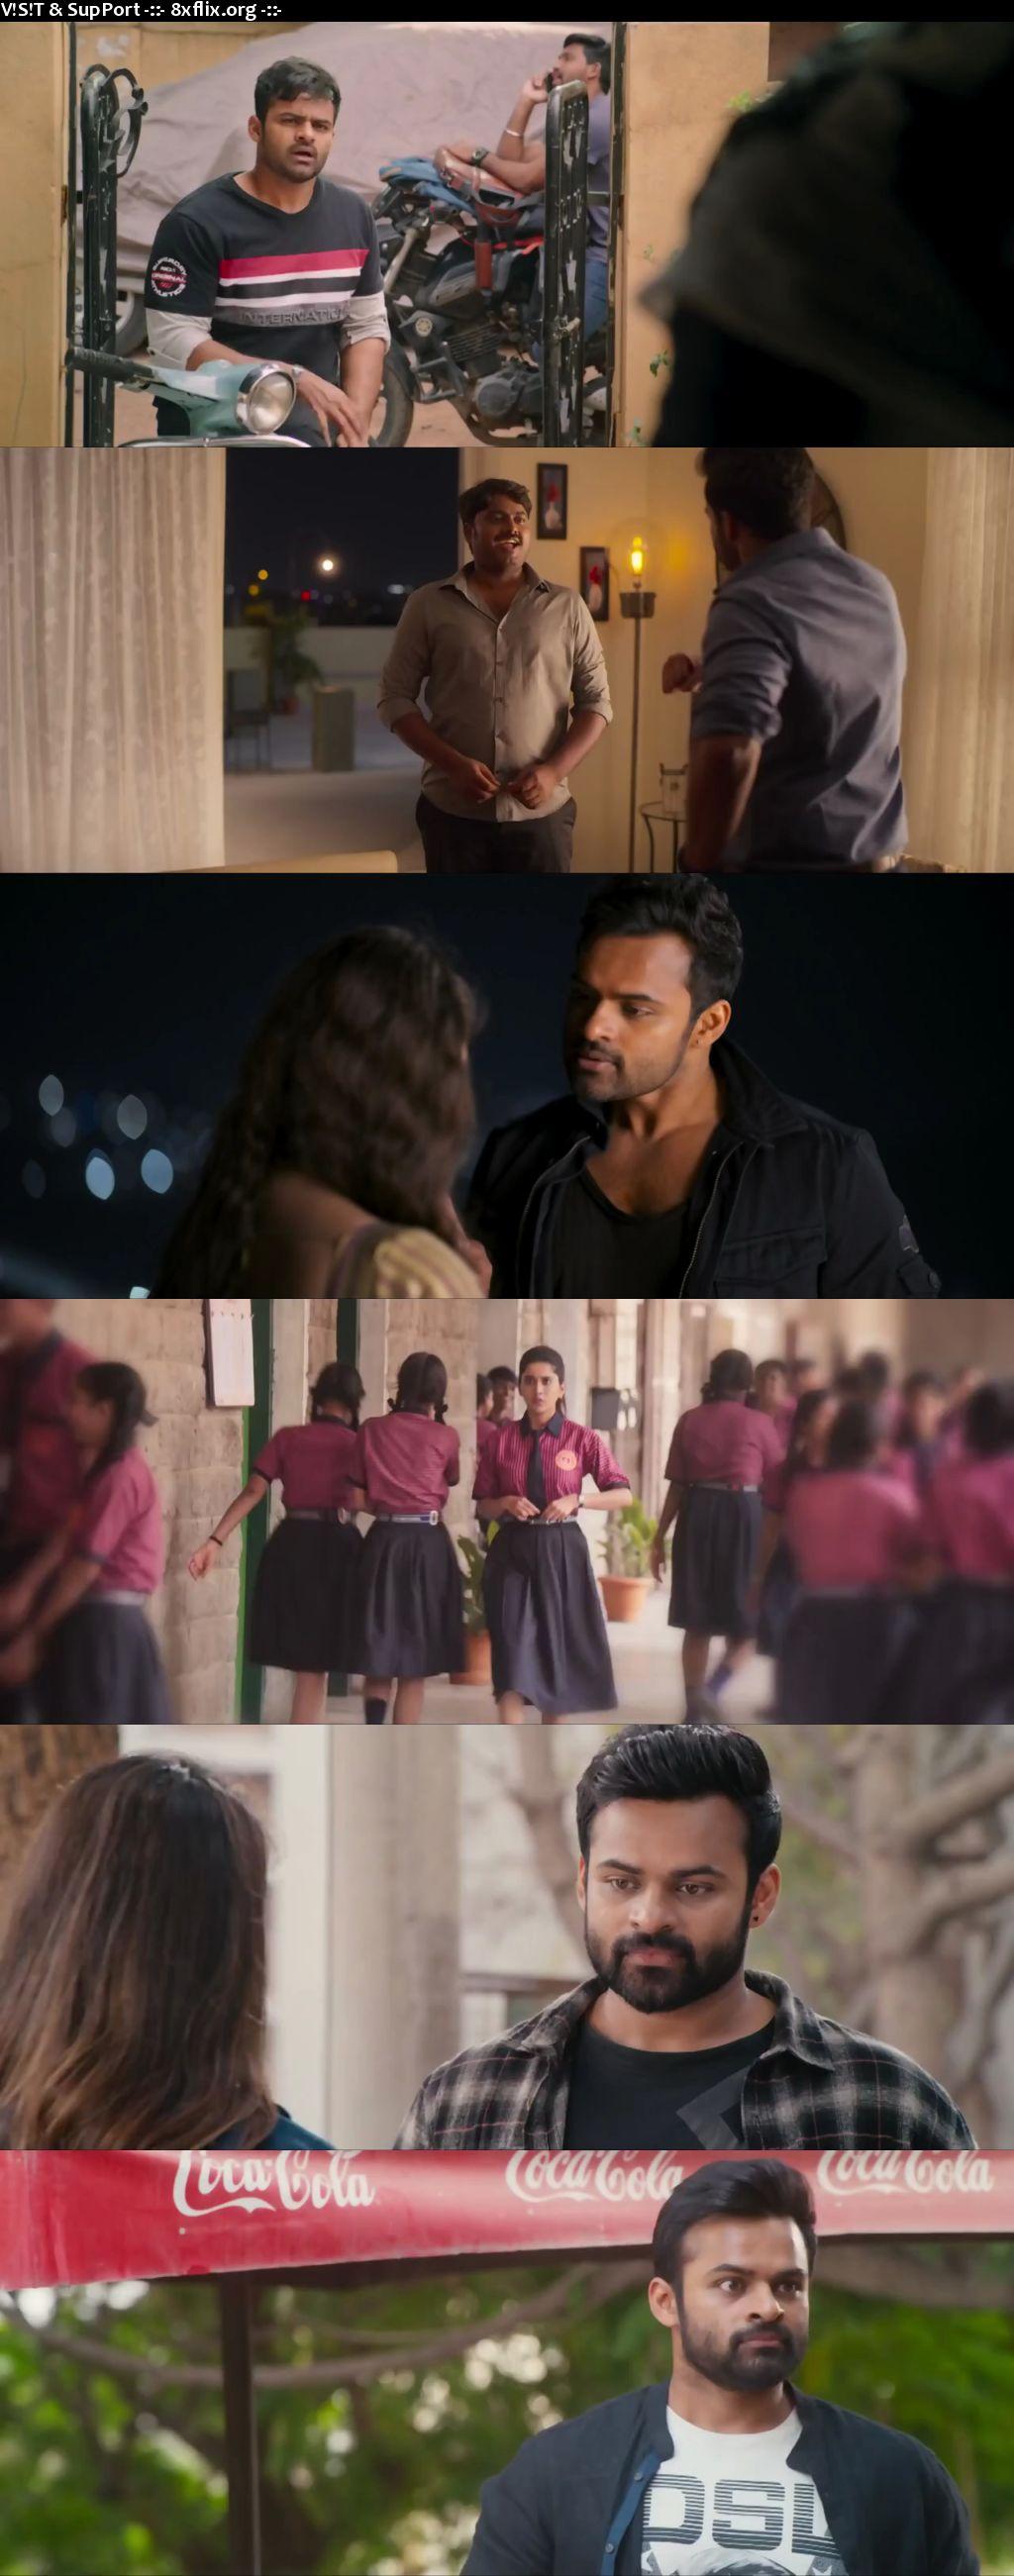 Solo Brathuke So Better 2020 Hindi Telugu Dual Audio 720p 480p UNCUT HDRip